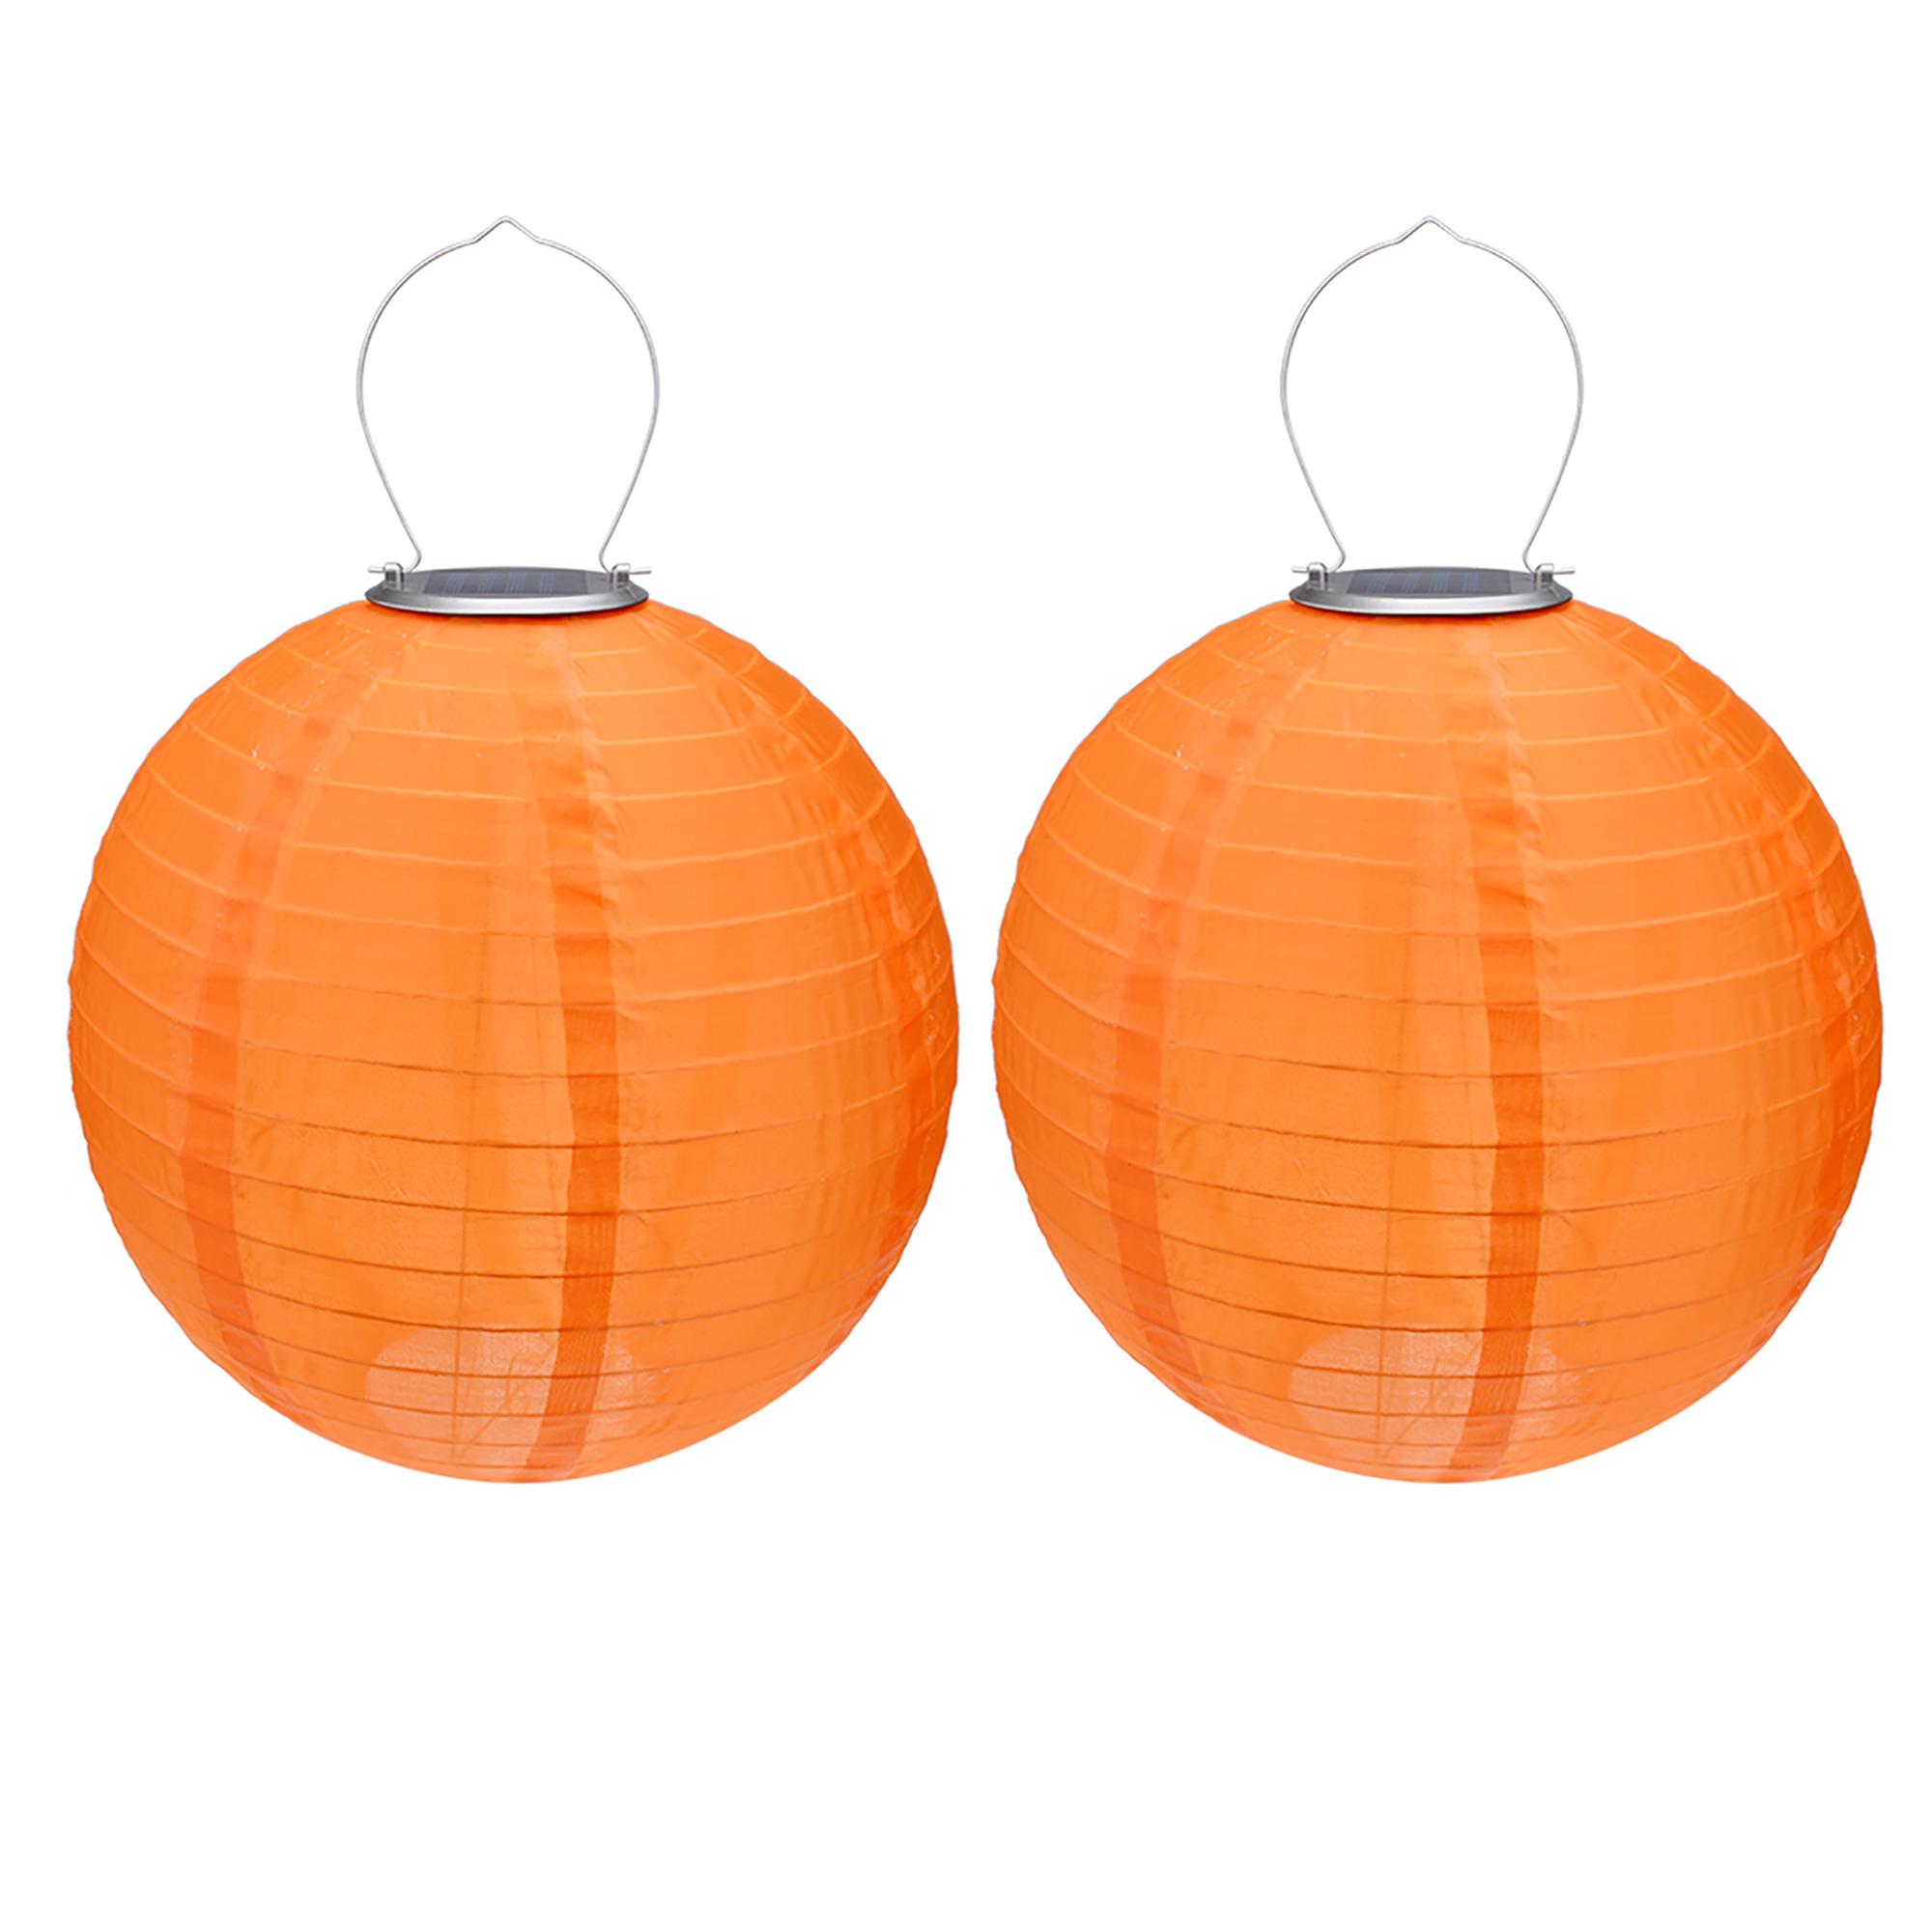 "2 Packs Orange 12"" Solar Powered Lanterns Hanging Solar Lamps  Garden"